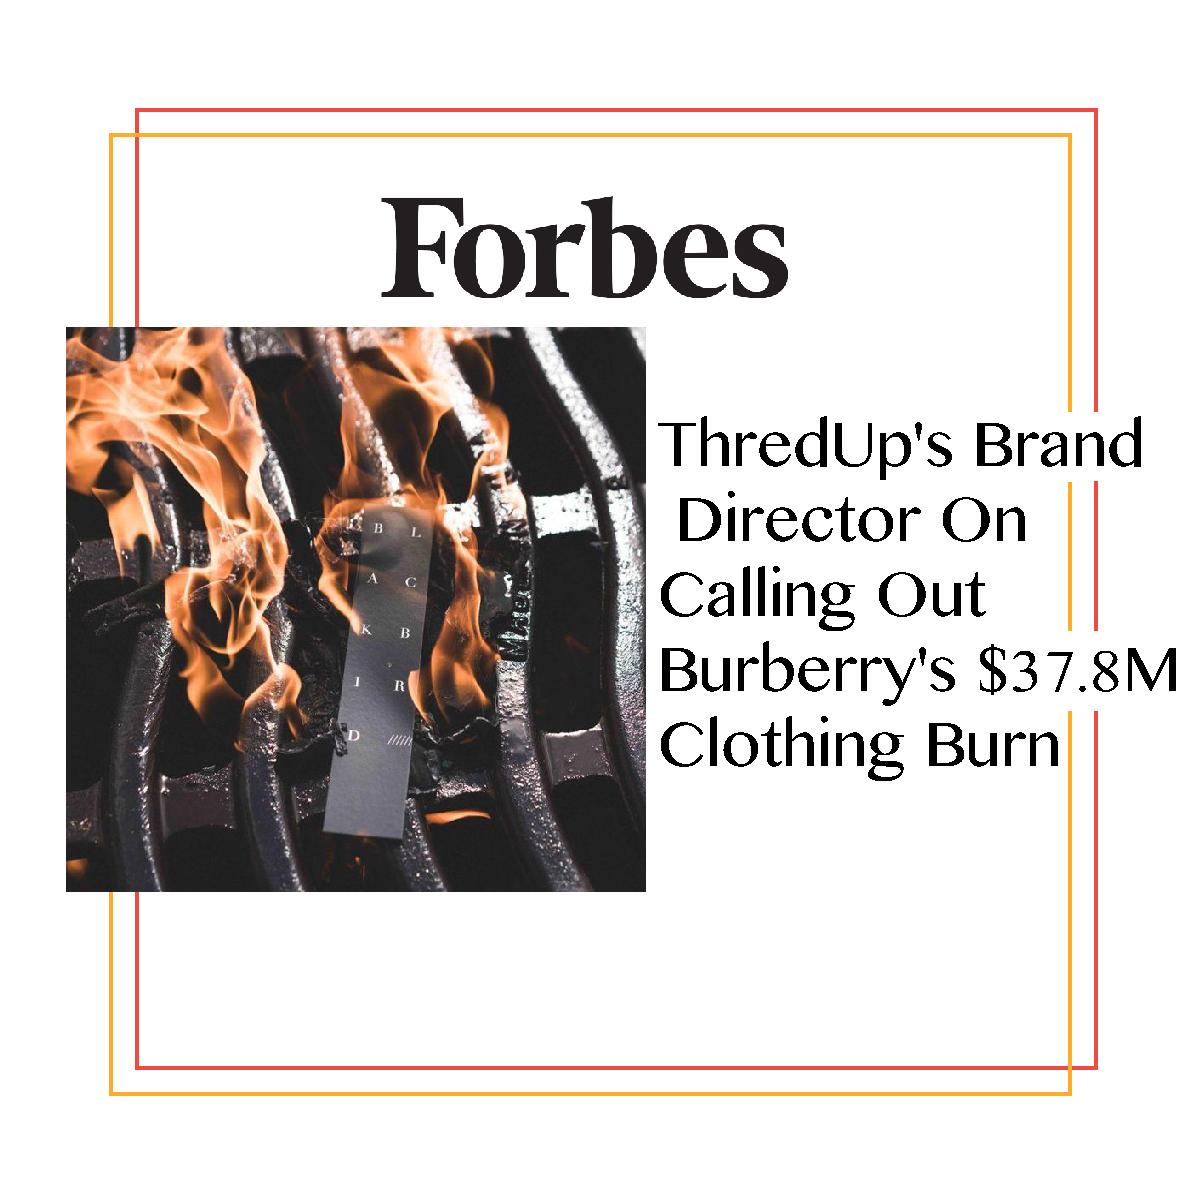 Forbes Magazine + ThredUP